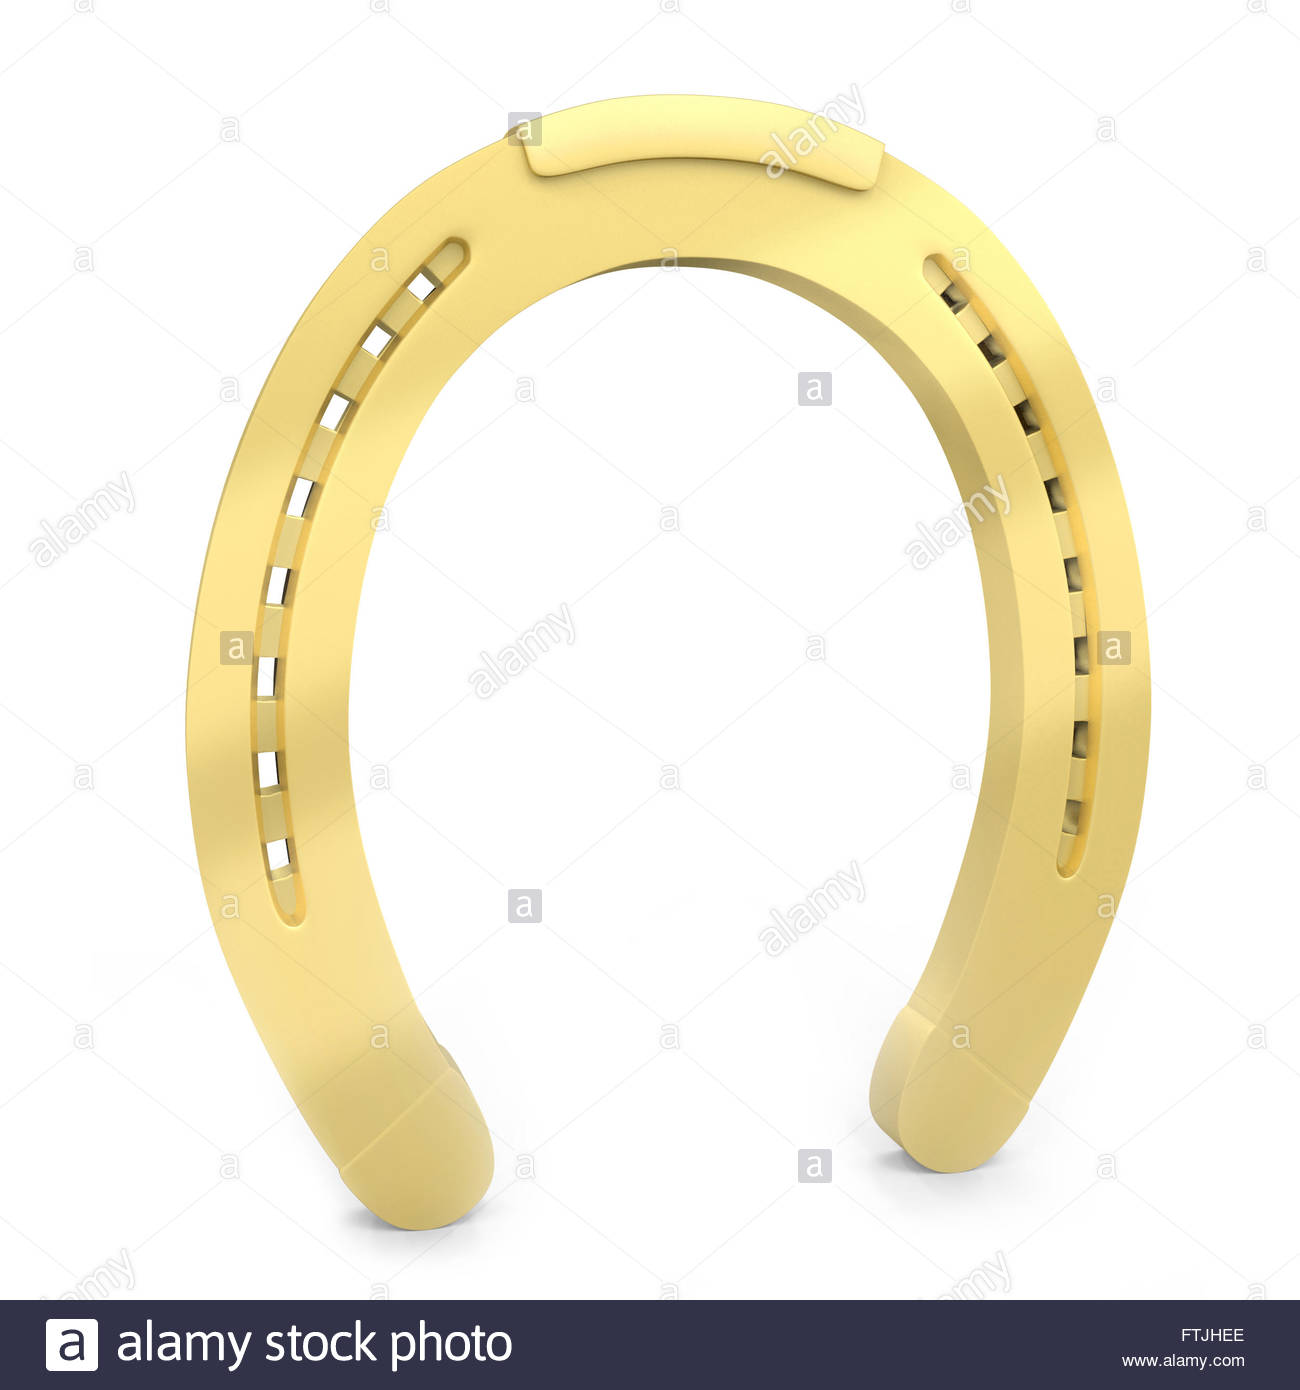 Uncategorized Lucky Symbol 3d golden horseshoe lucky symbol on white background stock photo background